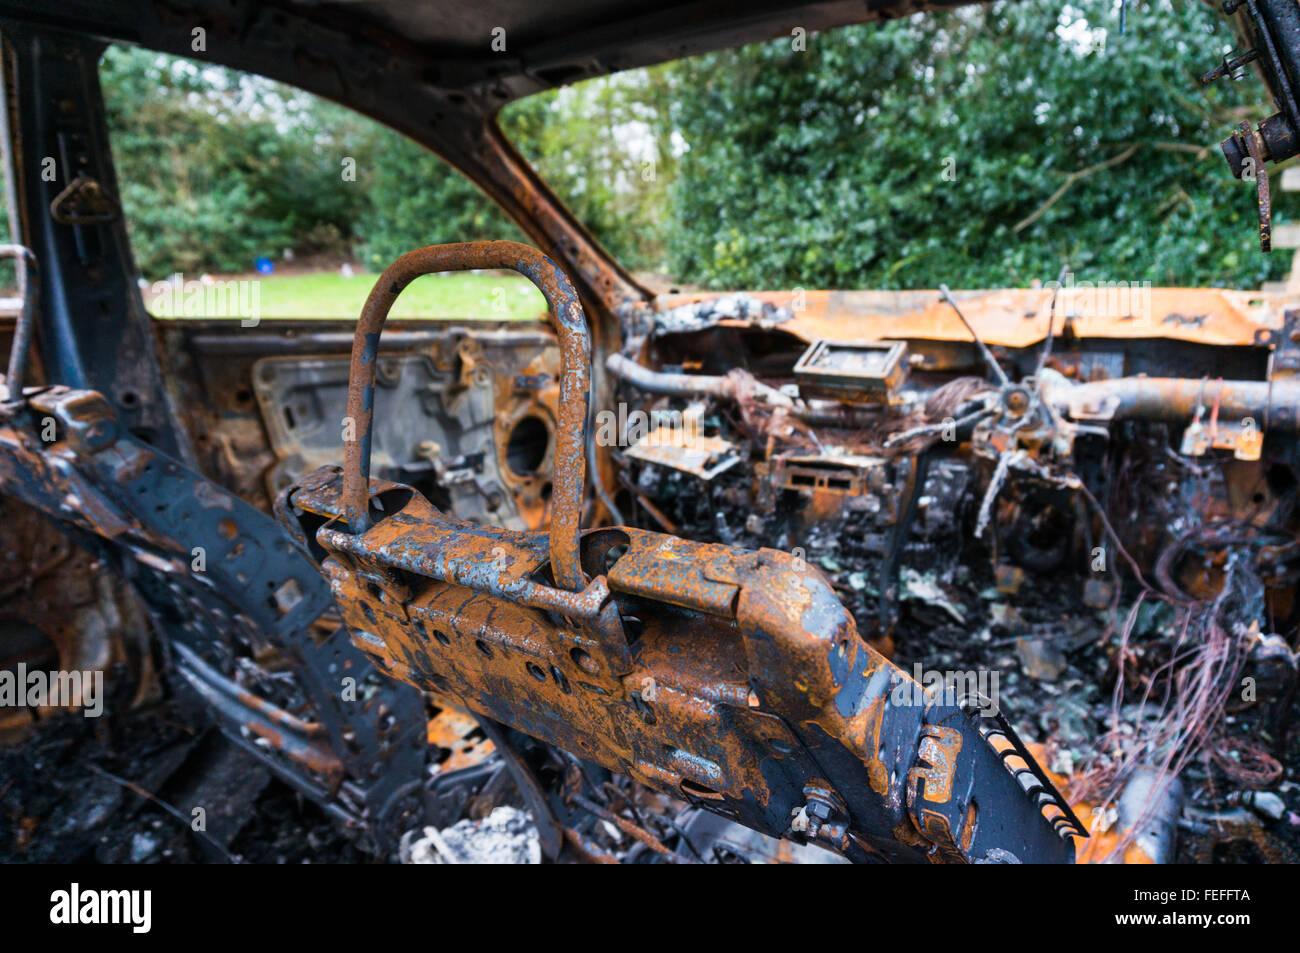 Inside of an abandoned fire damaged car - Stock Image